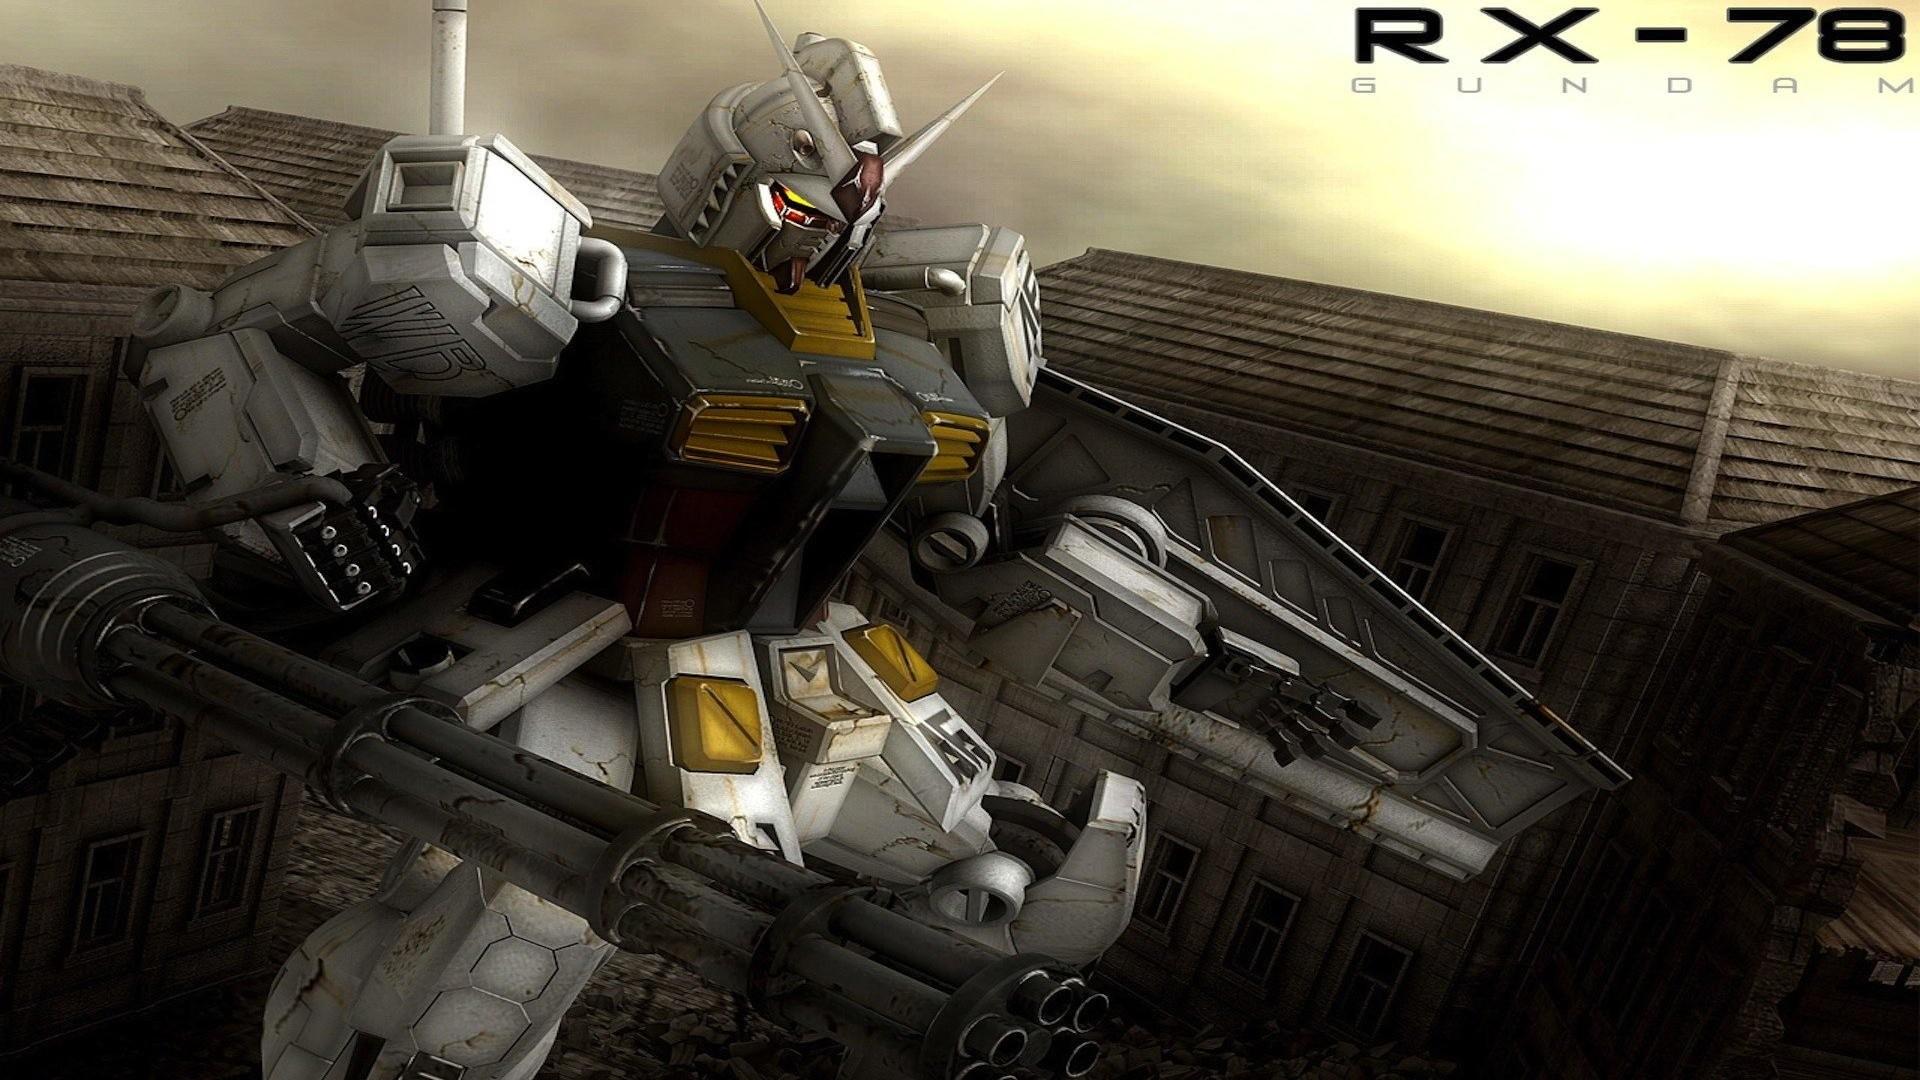 Anime – Gundam Wallpaper